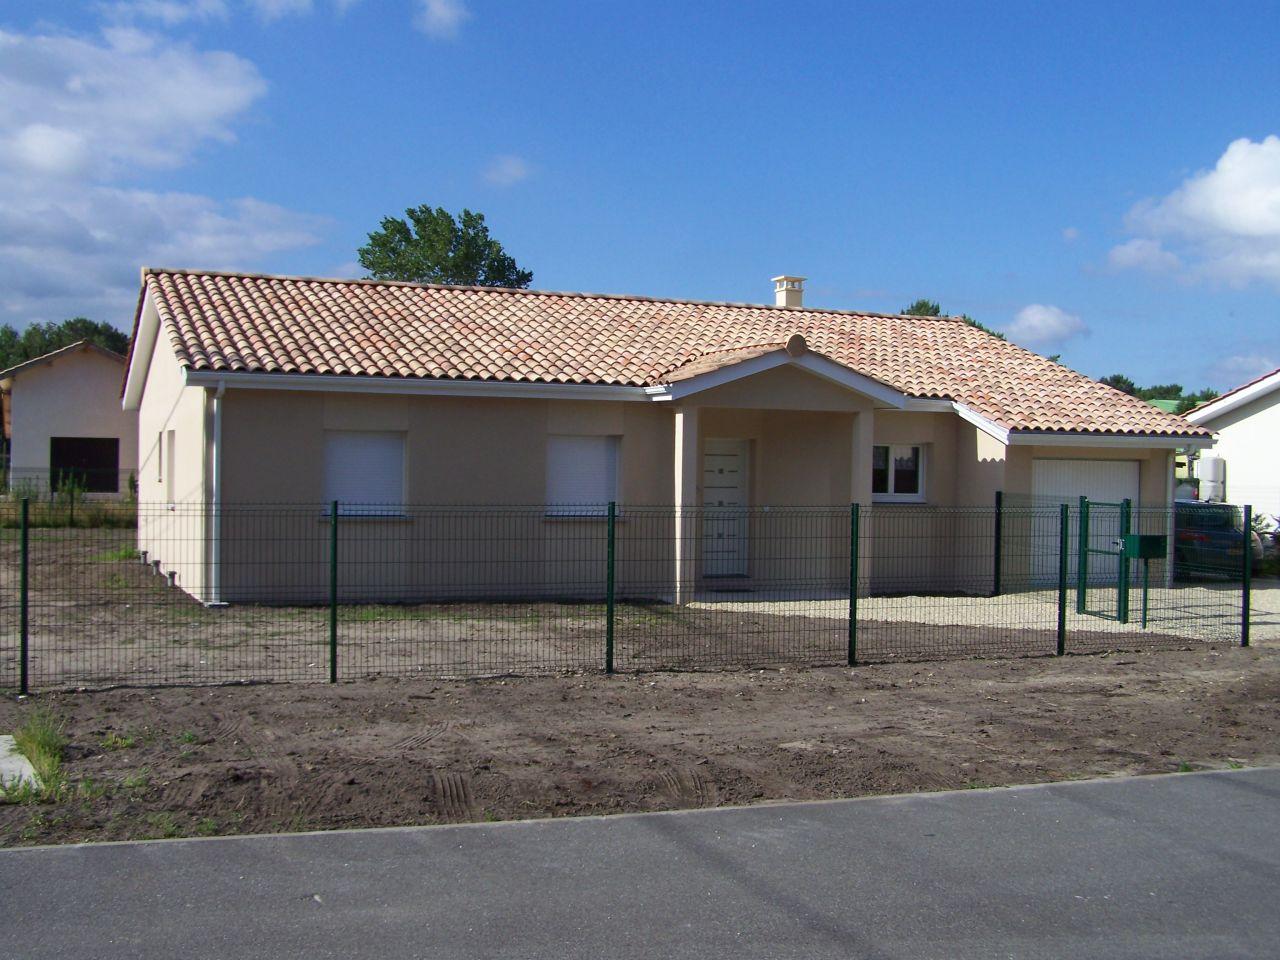 Constructeur maison gironde mca for Plan maison mca